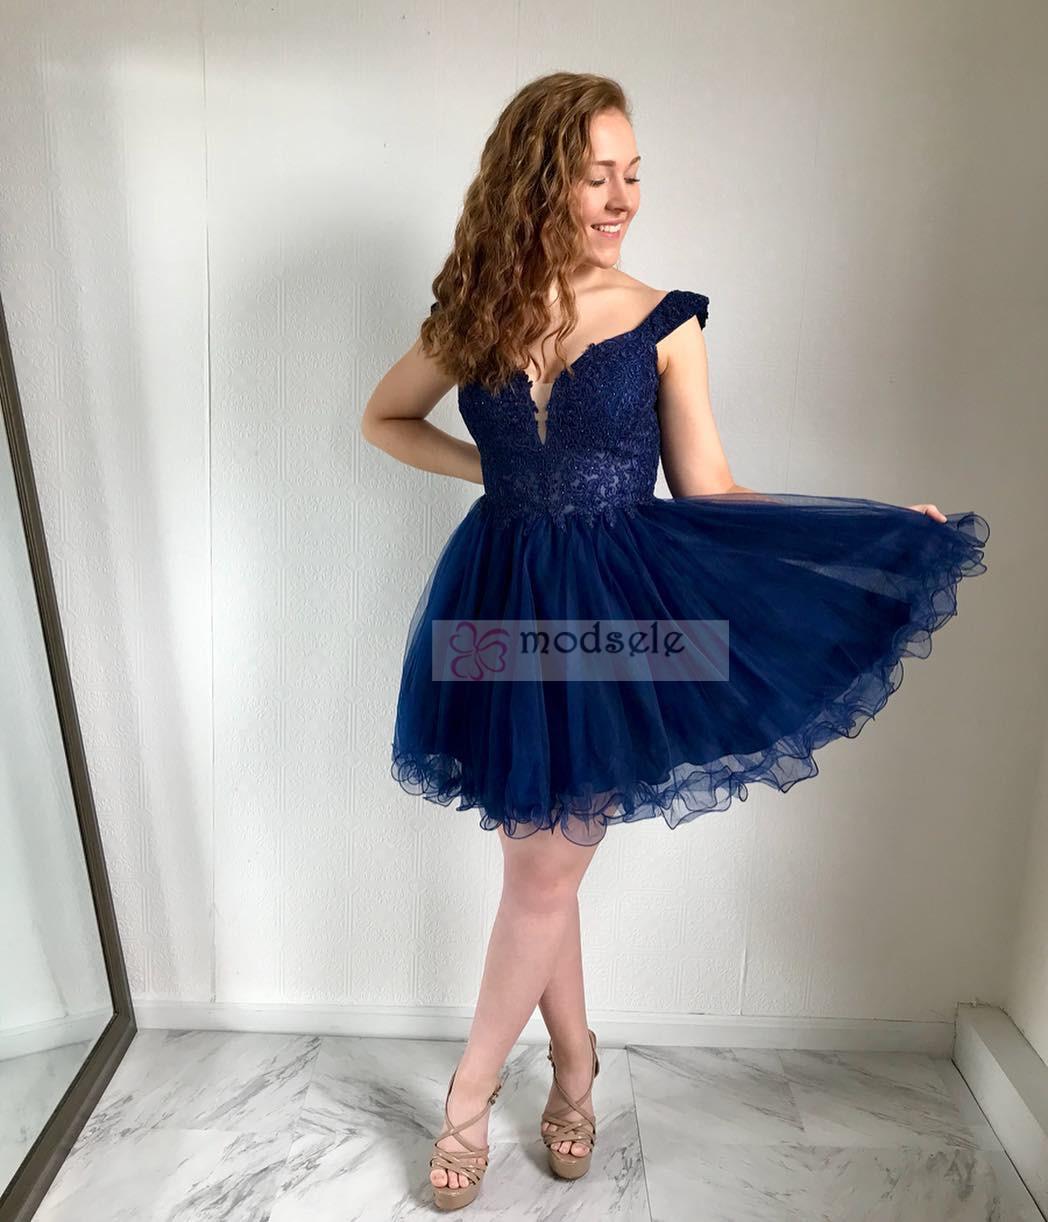 d52f3754484 Off the Shoulder Short Navy Blue Hoco Dress Dancing Dress · modsele ...